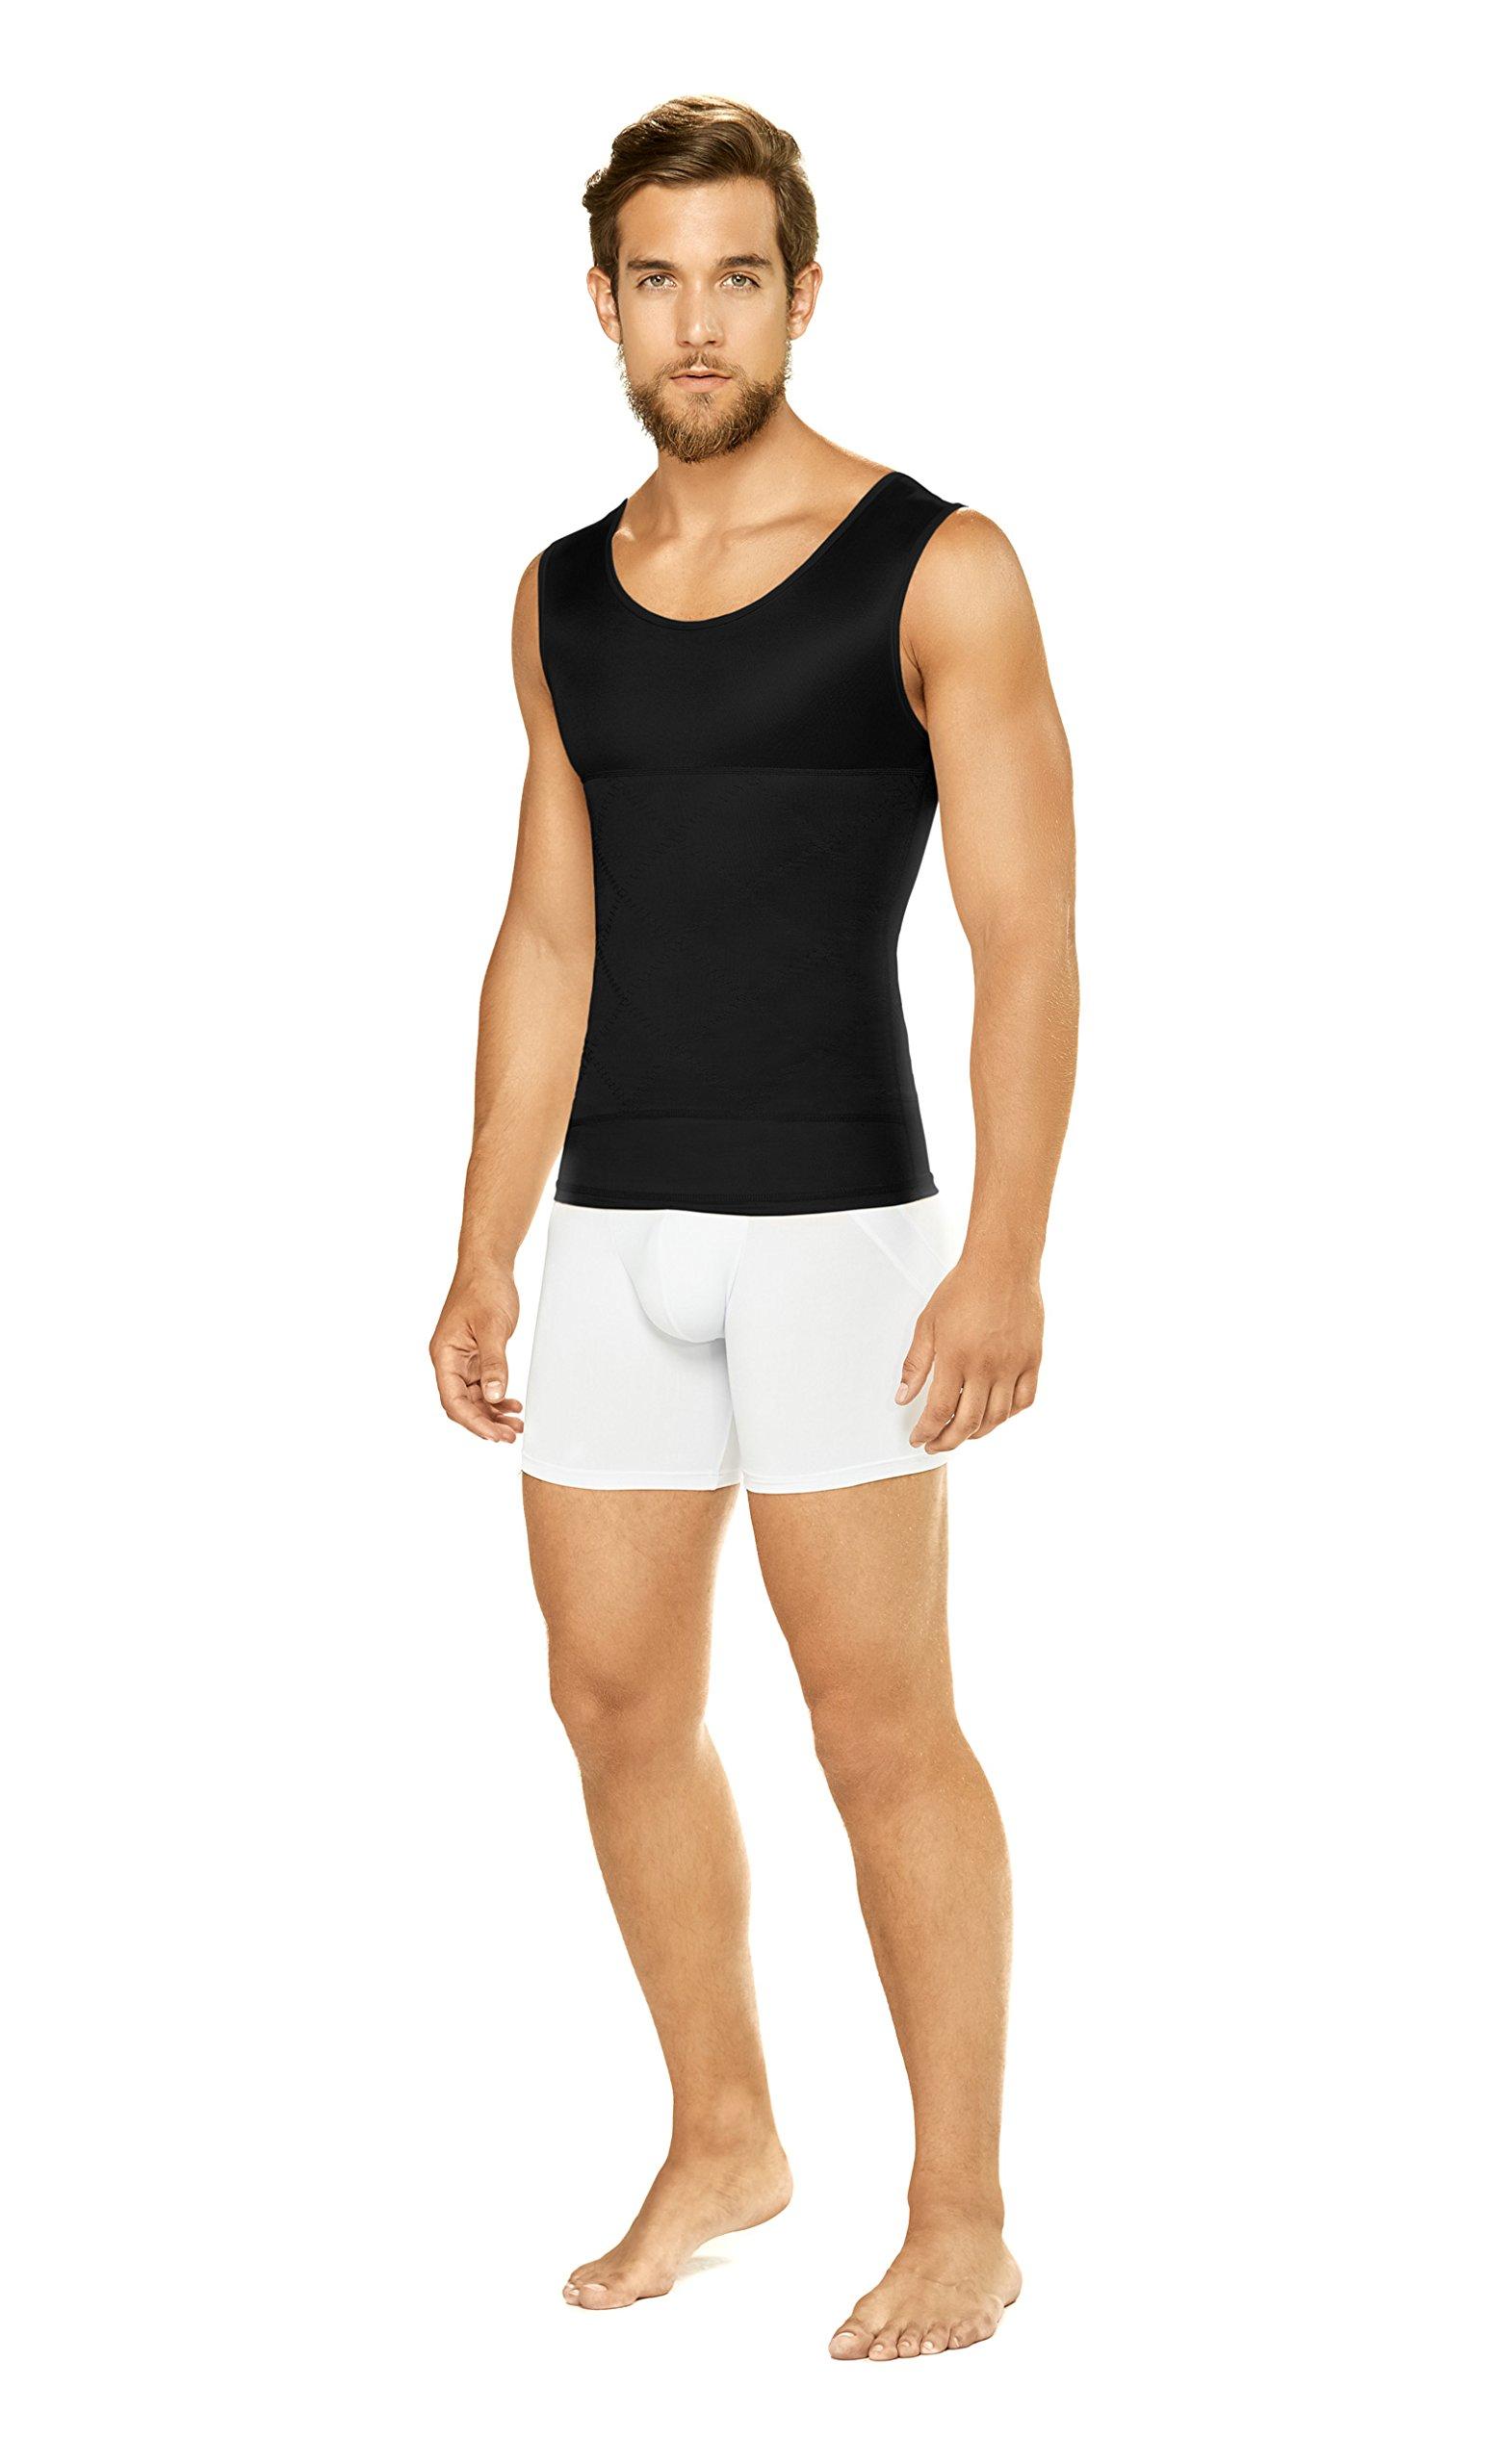 Diane & Geordi Men Torso Tummy Toner Body Shaper Compression Sleeveless Undetectable Under Clothes Slimmer Shirt Faja Reductora Moldeadora Black L